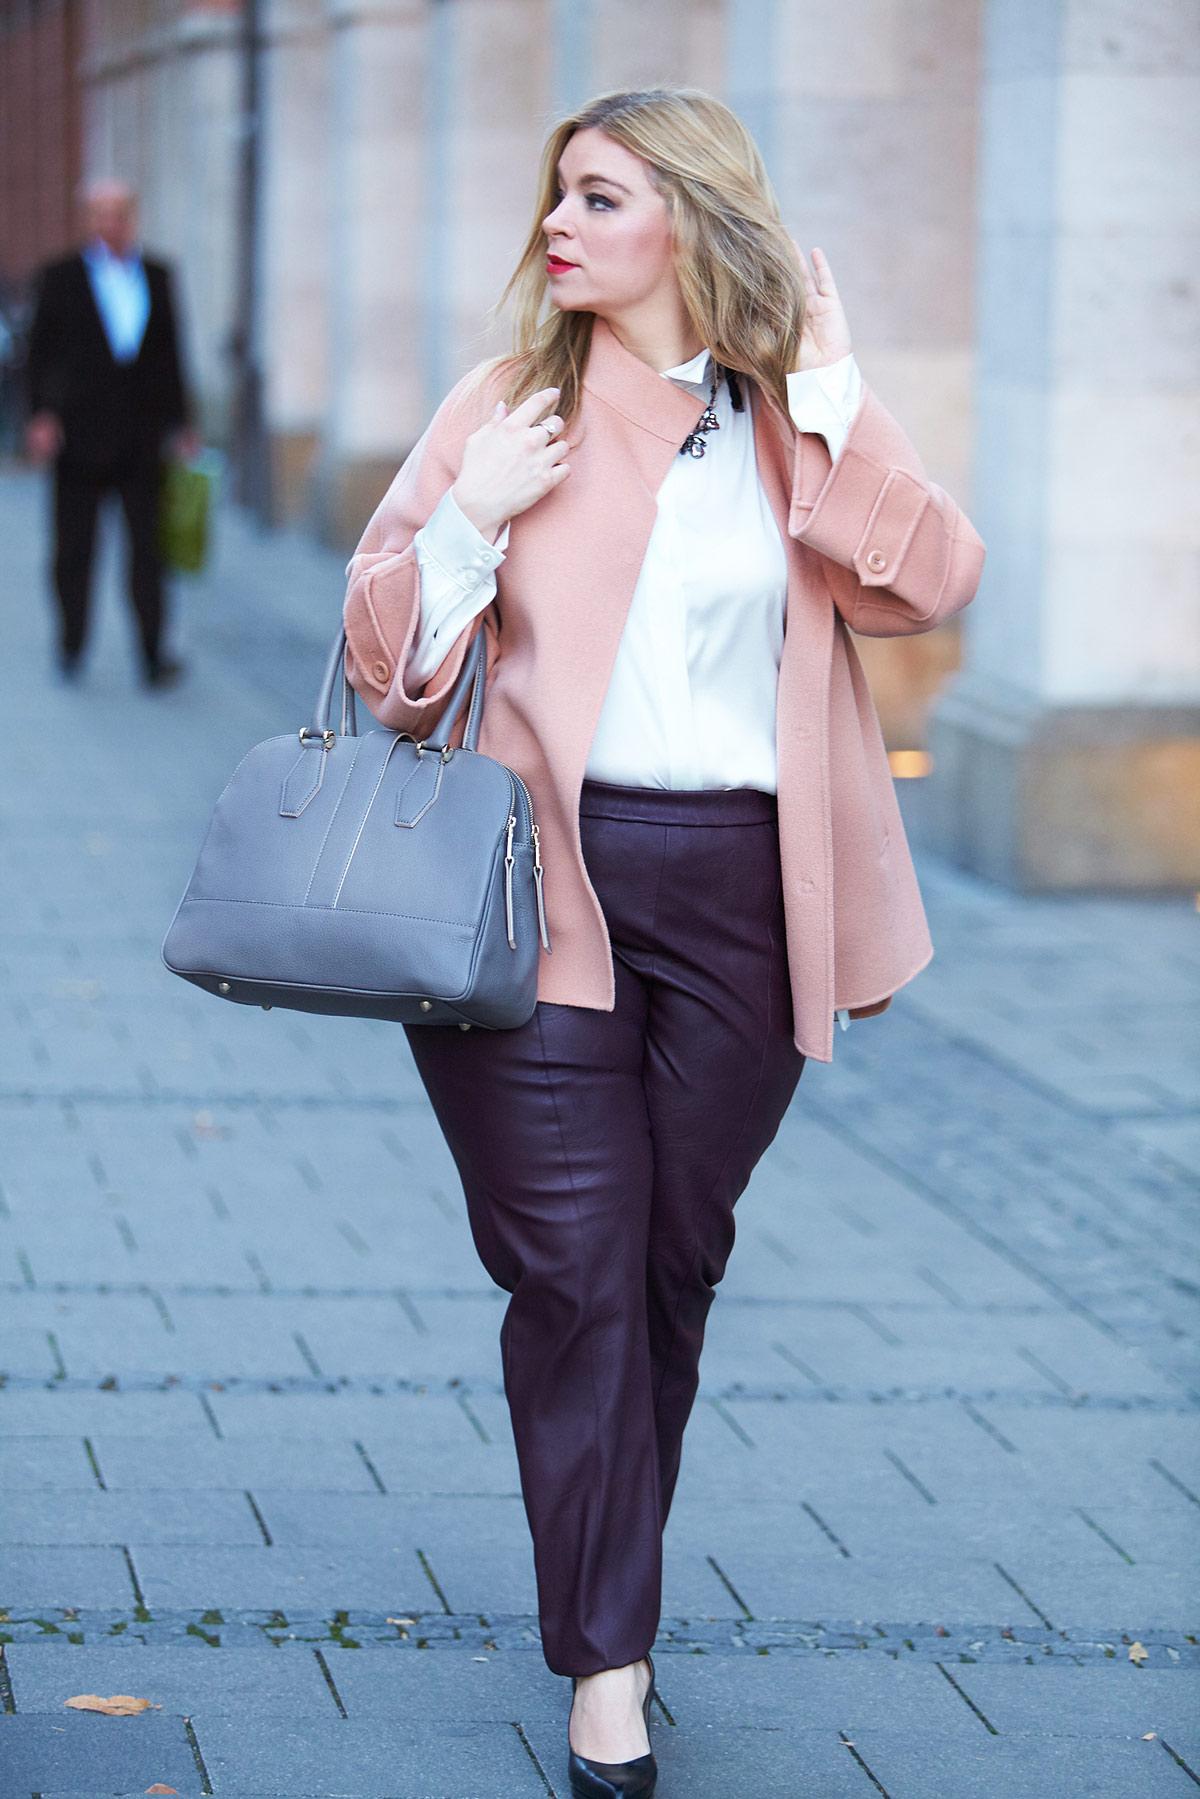 Marinarinaldi-Megabambi-Caterina-pogorzelski-Plussizeblogger-Plussizemodel